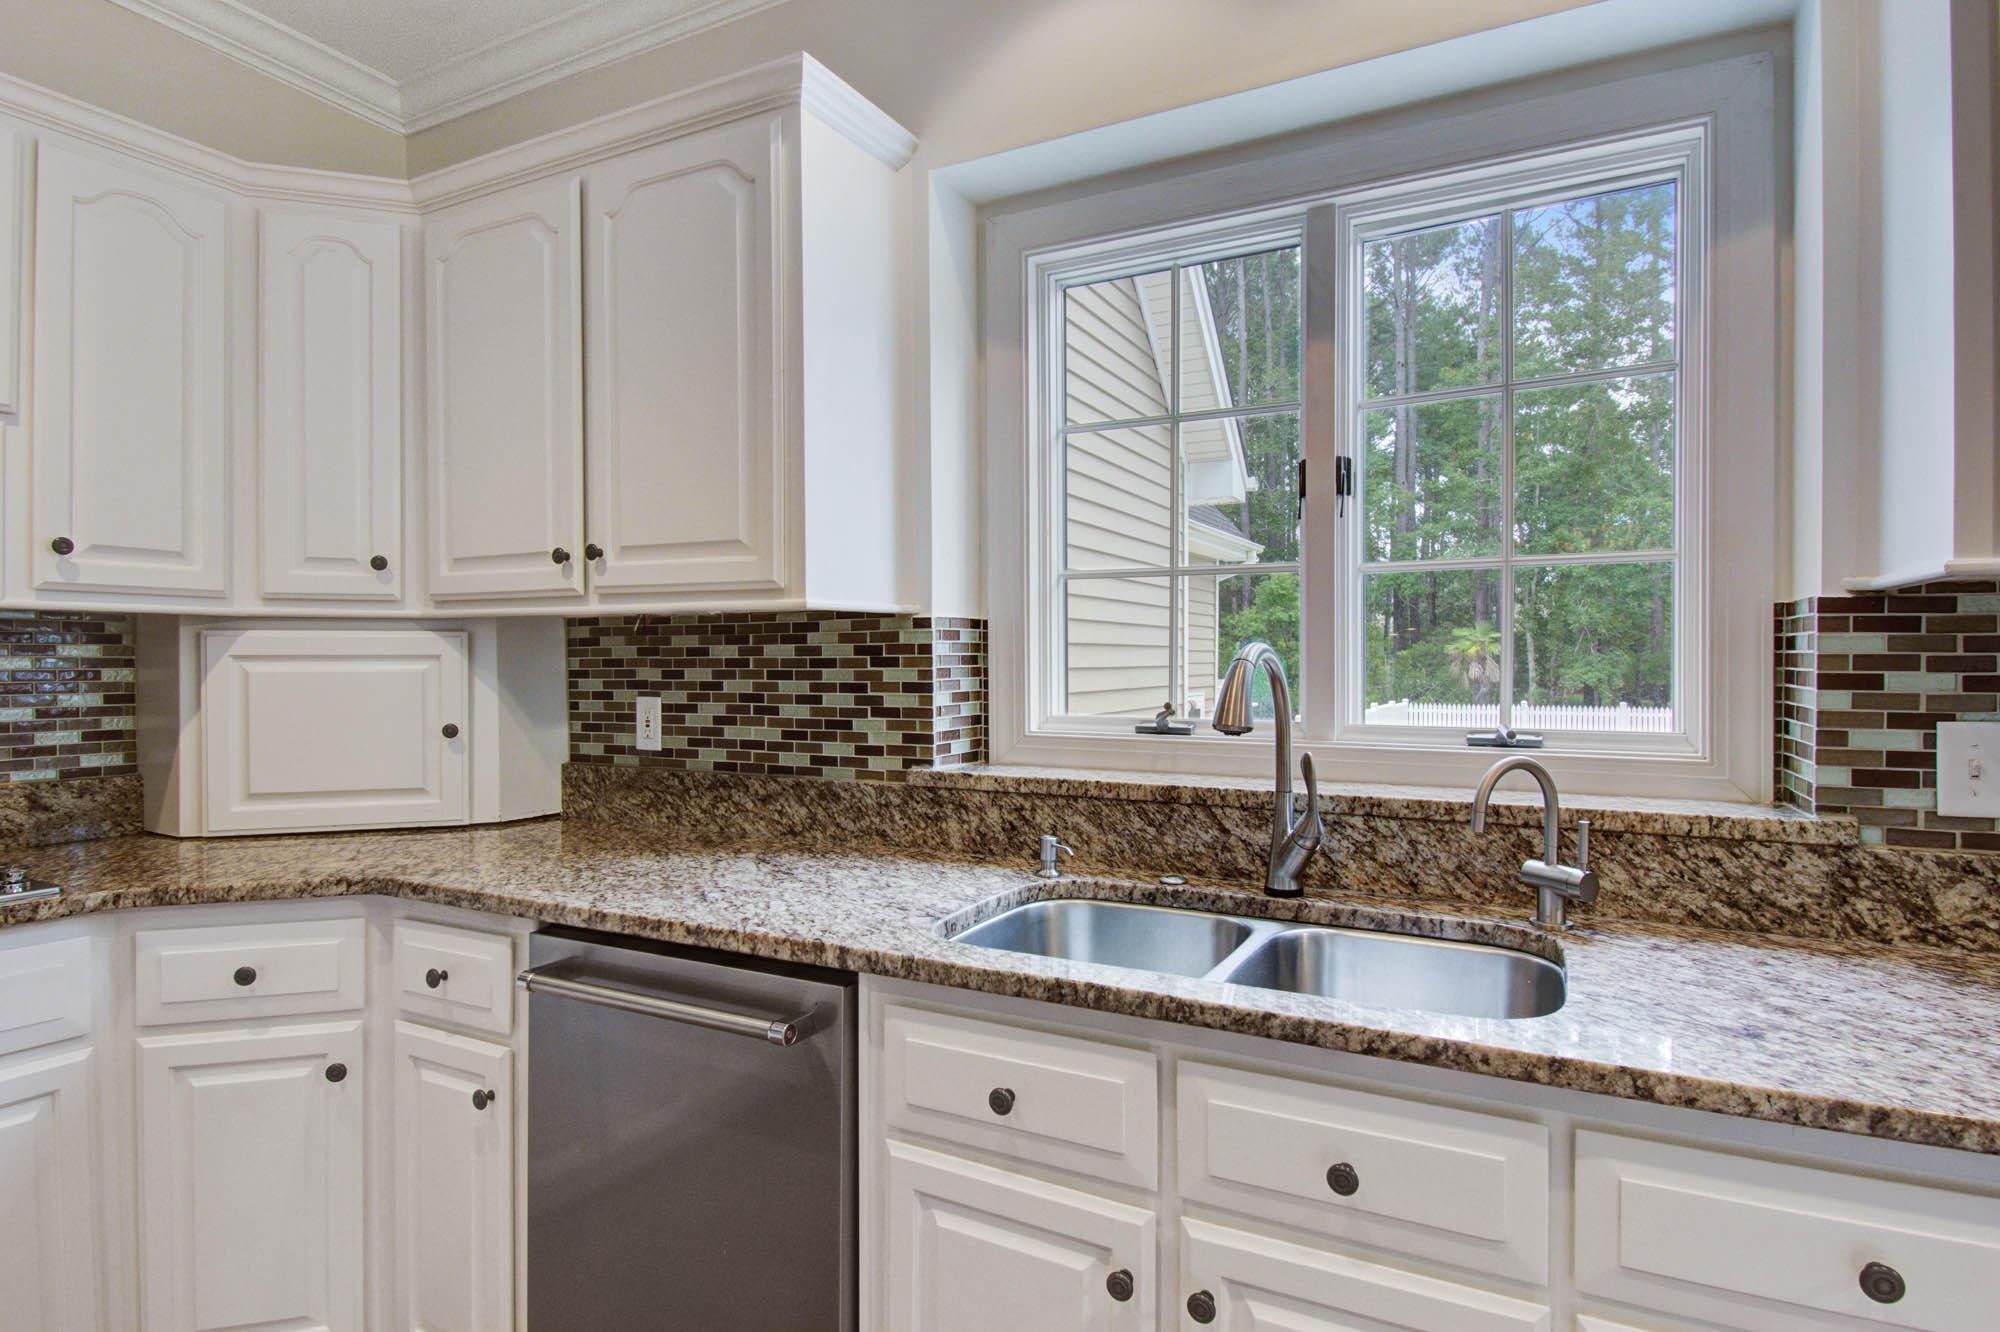 Dunes West Homes For Sale - 3515 Colonel Vanderhorst, Mount Pleasant, SC - 46